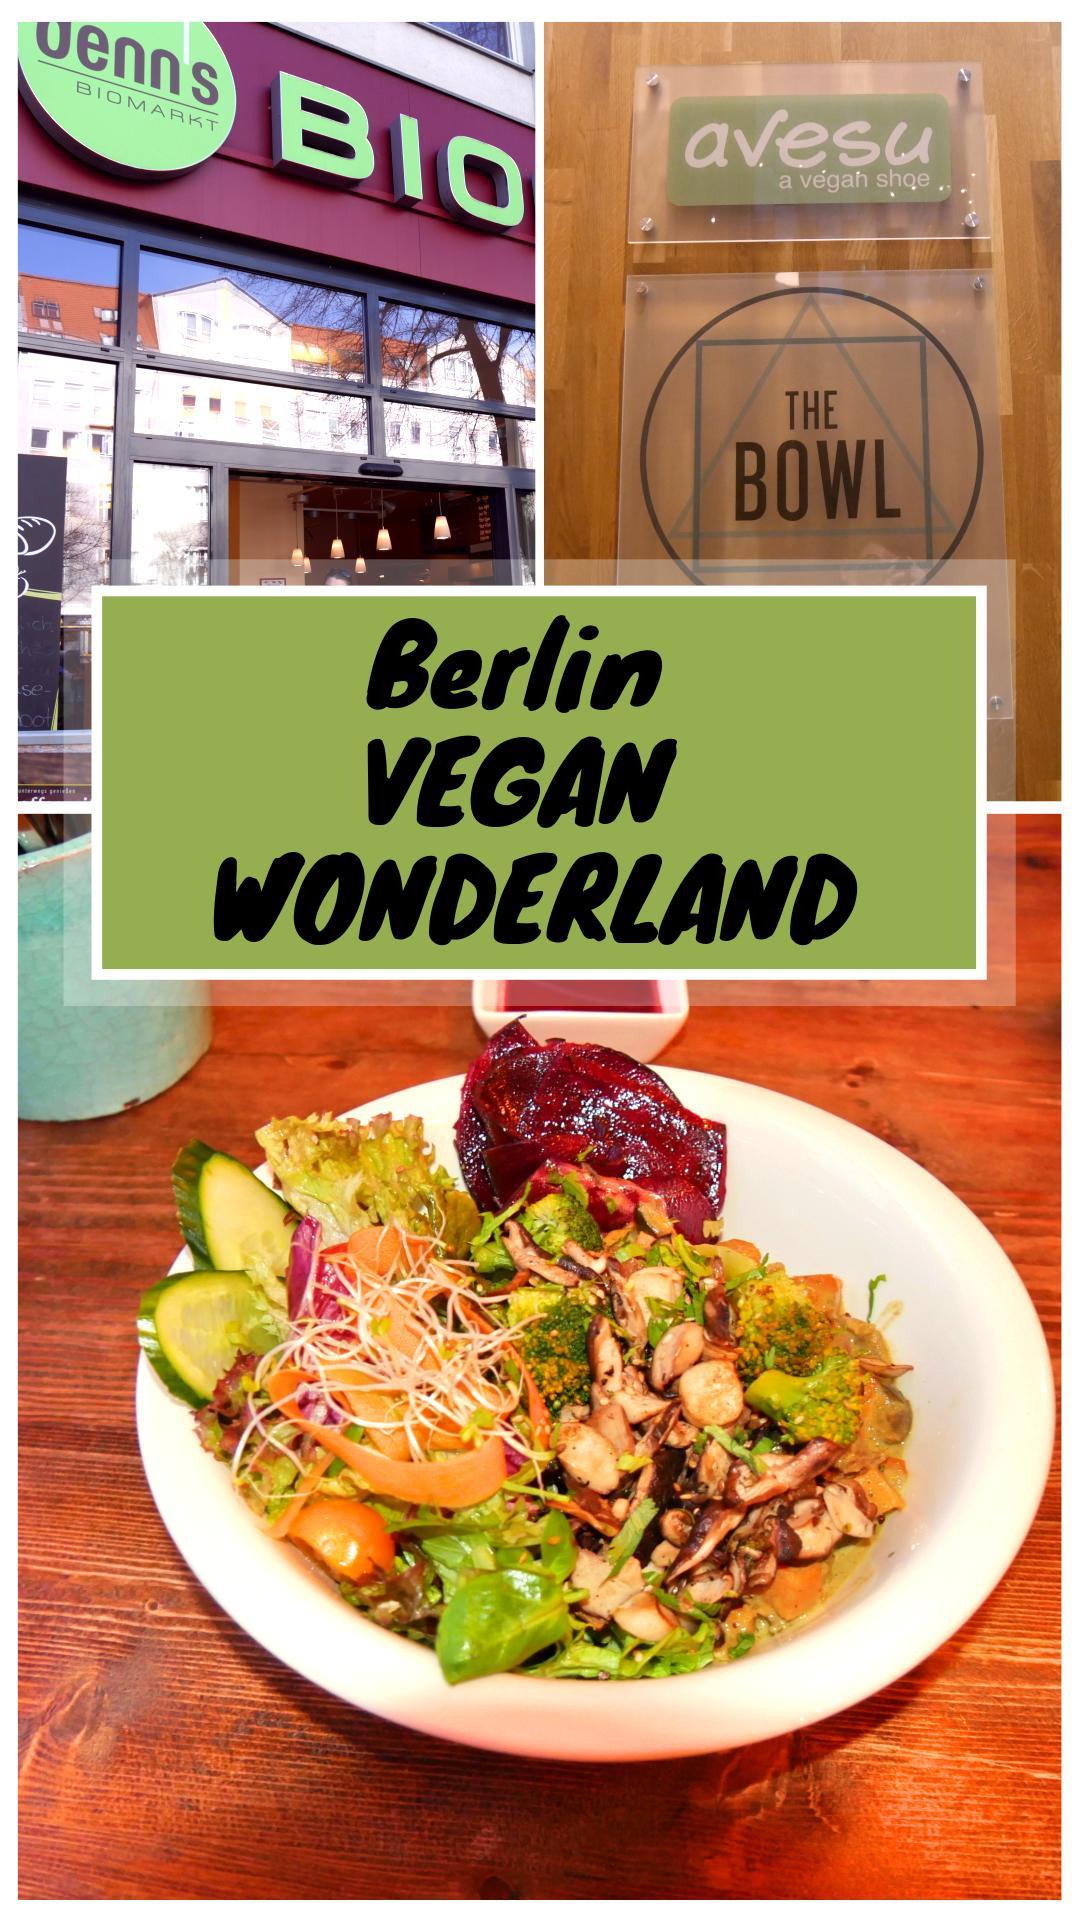 vegan berlin paradis des vegetariens ville des vegetariens